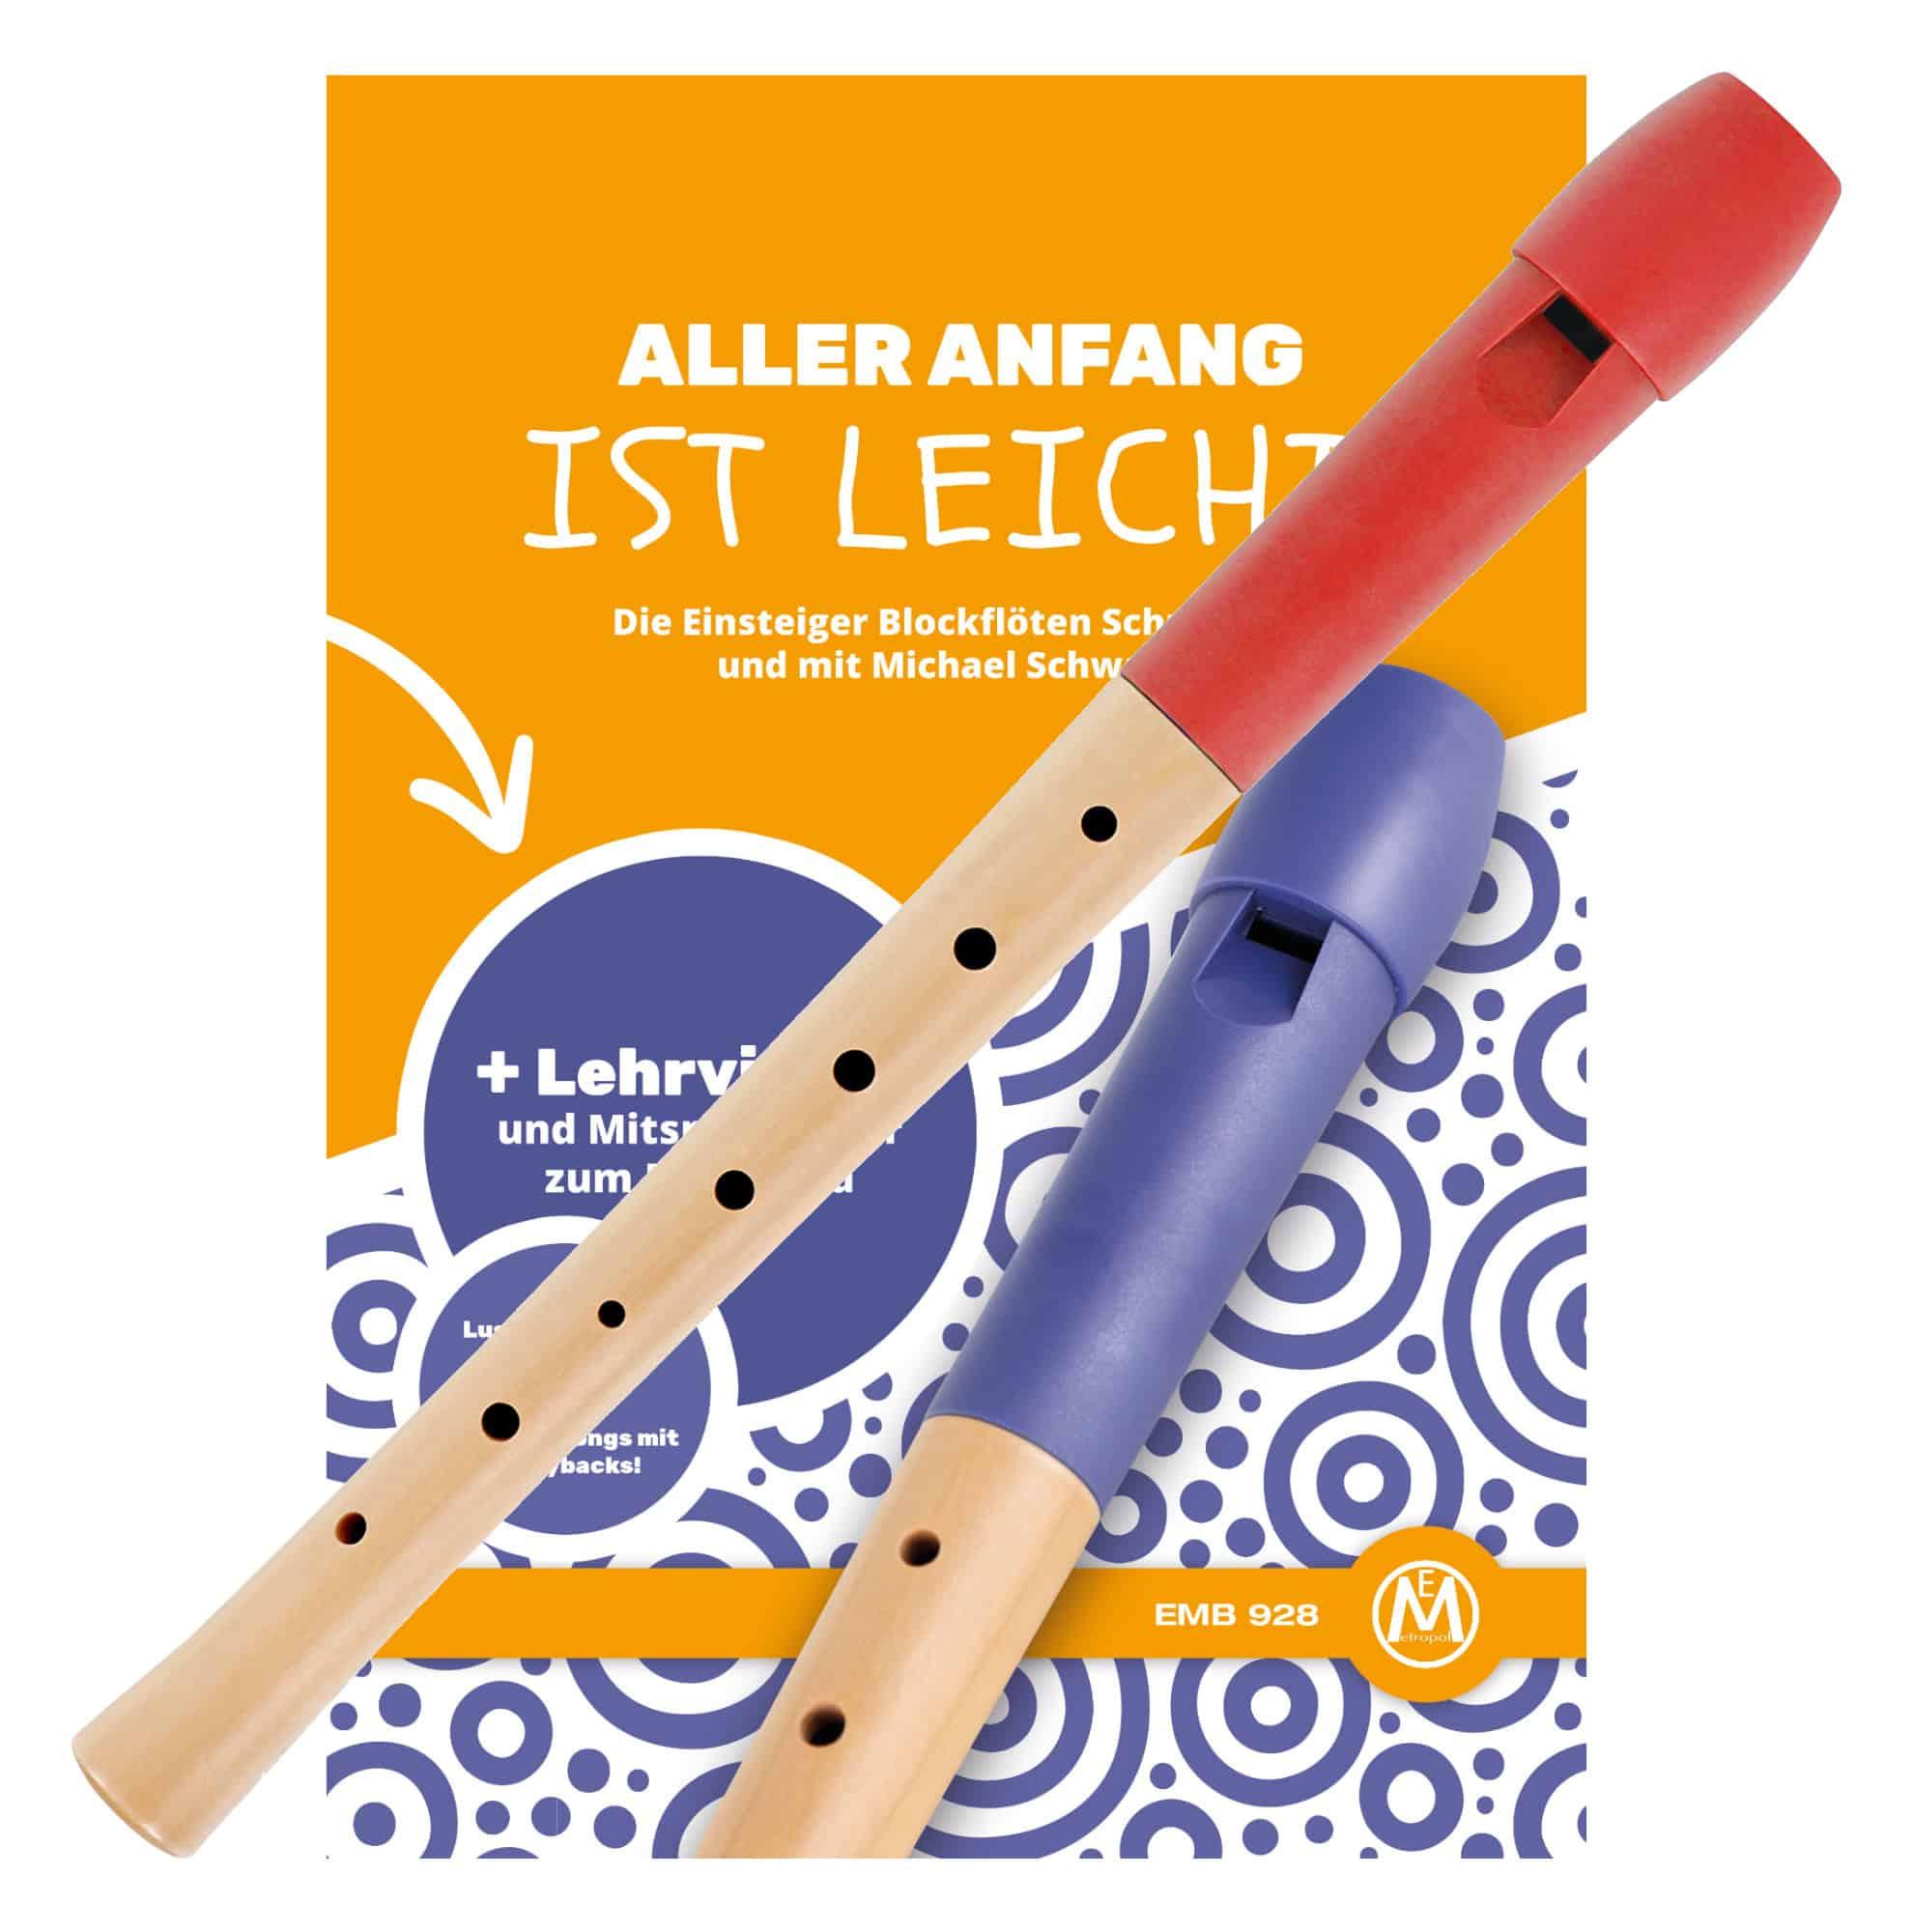 Classic Cantabile Pivella Blockflöte deutsch rot Set inkl. Flötenschule 'Aller Anfang ist leicht'